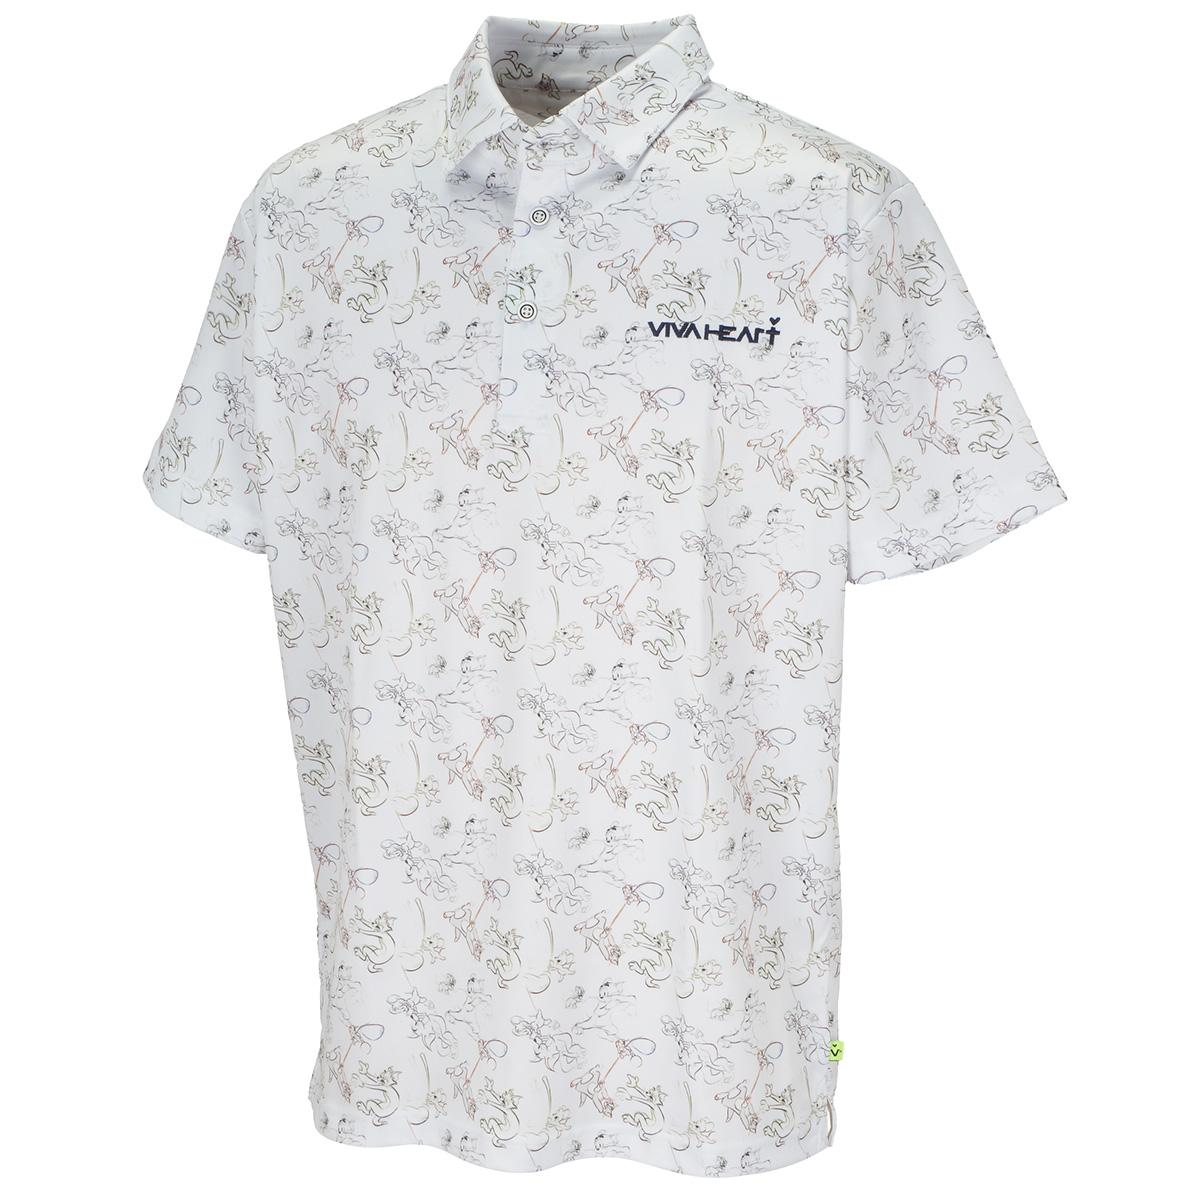 T&Jプリント 半袖ポロシャツ